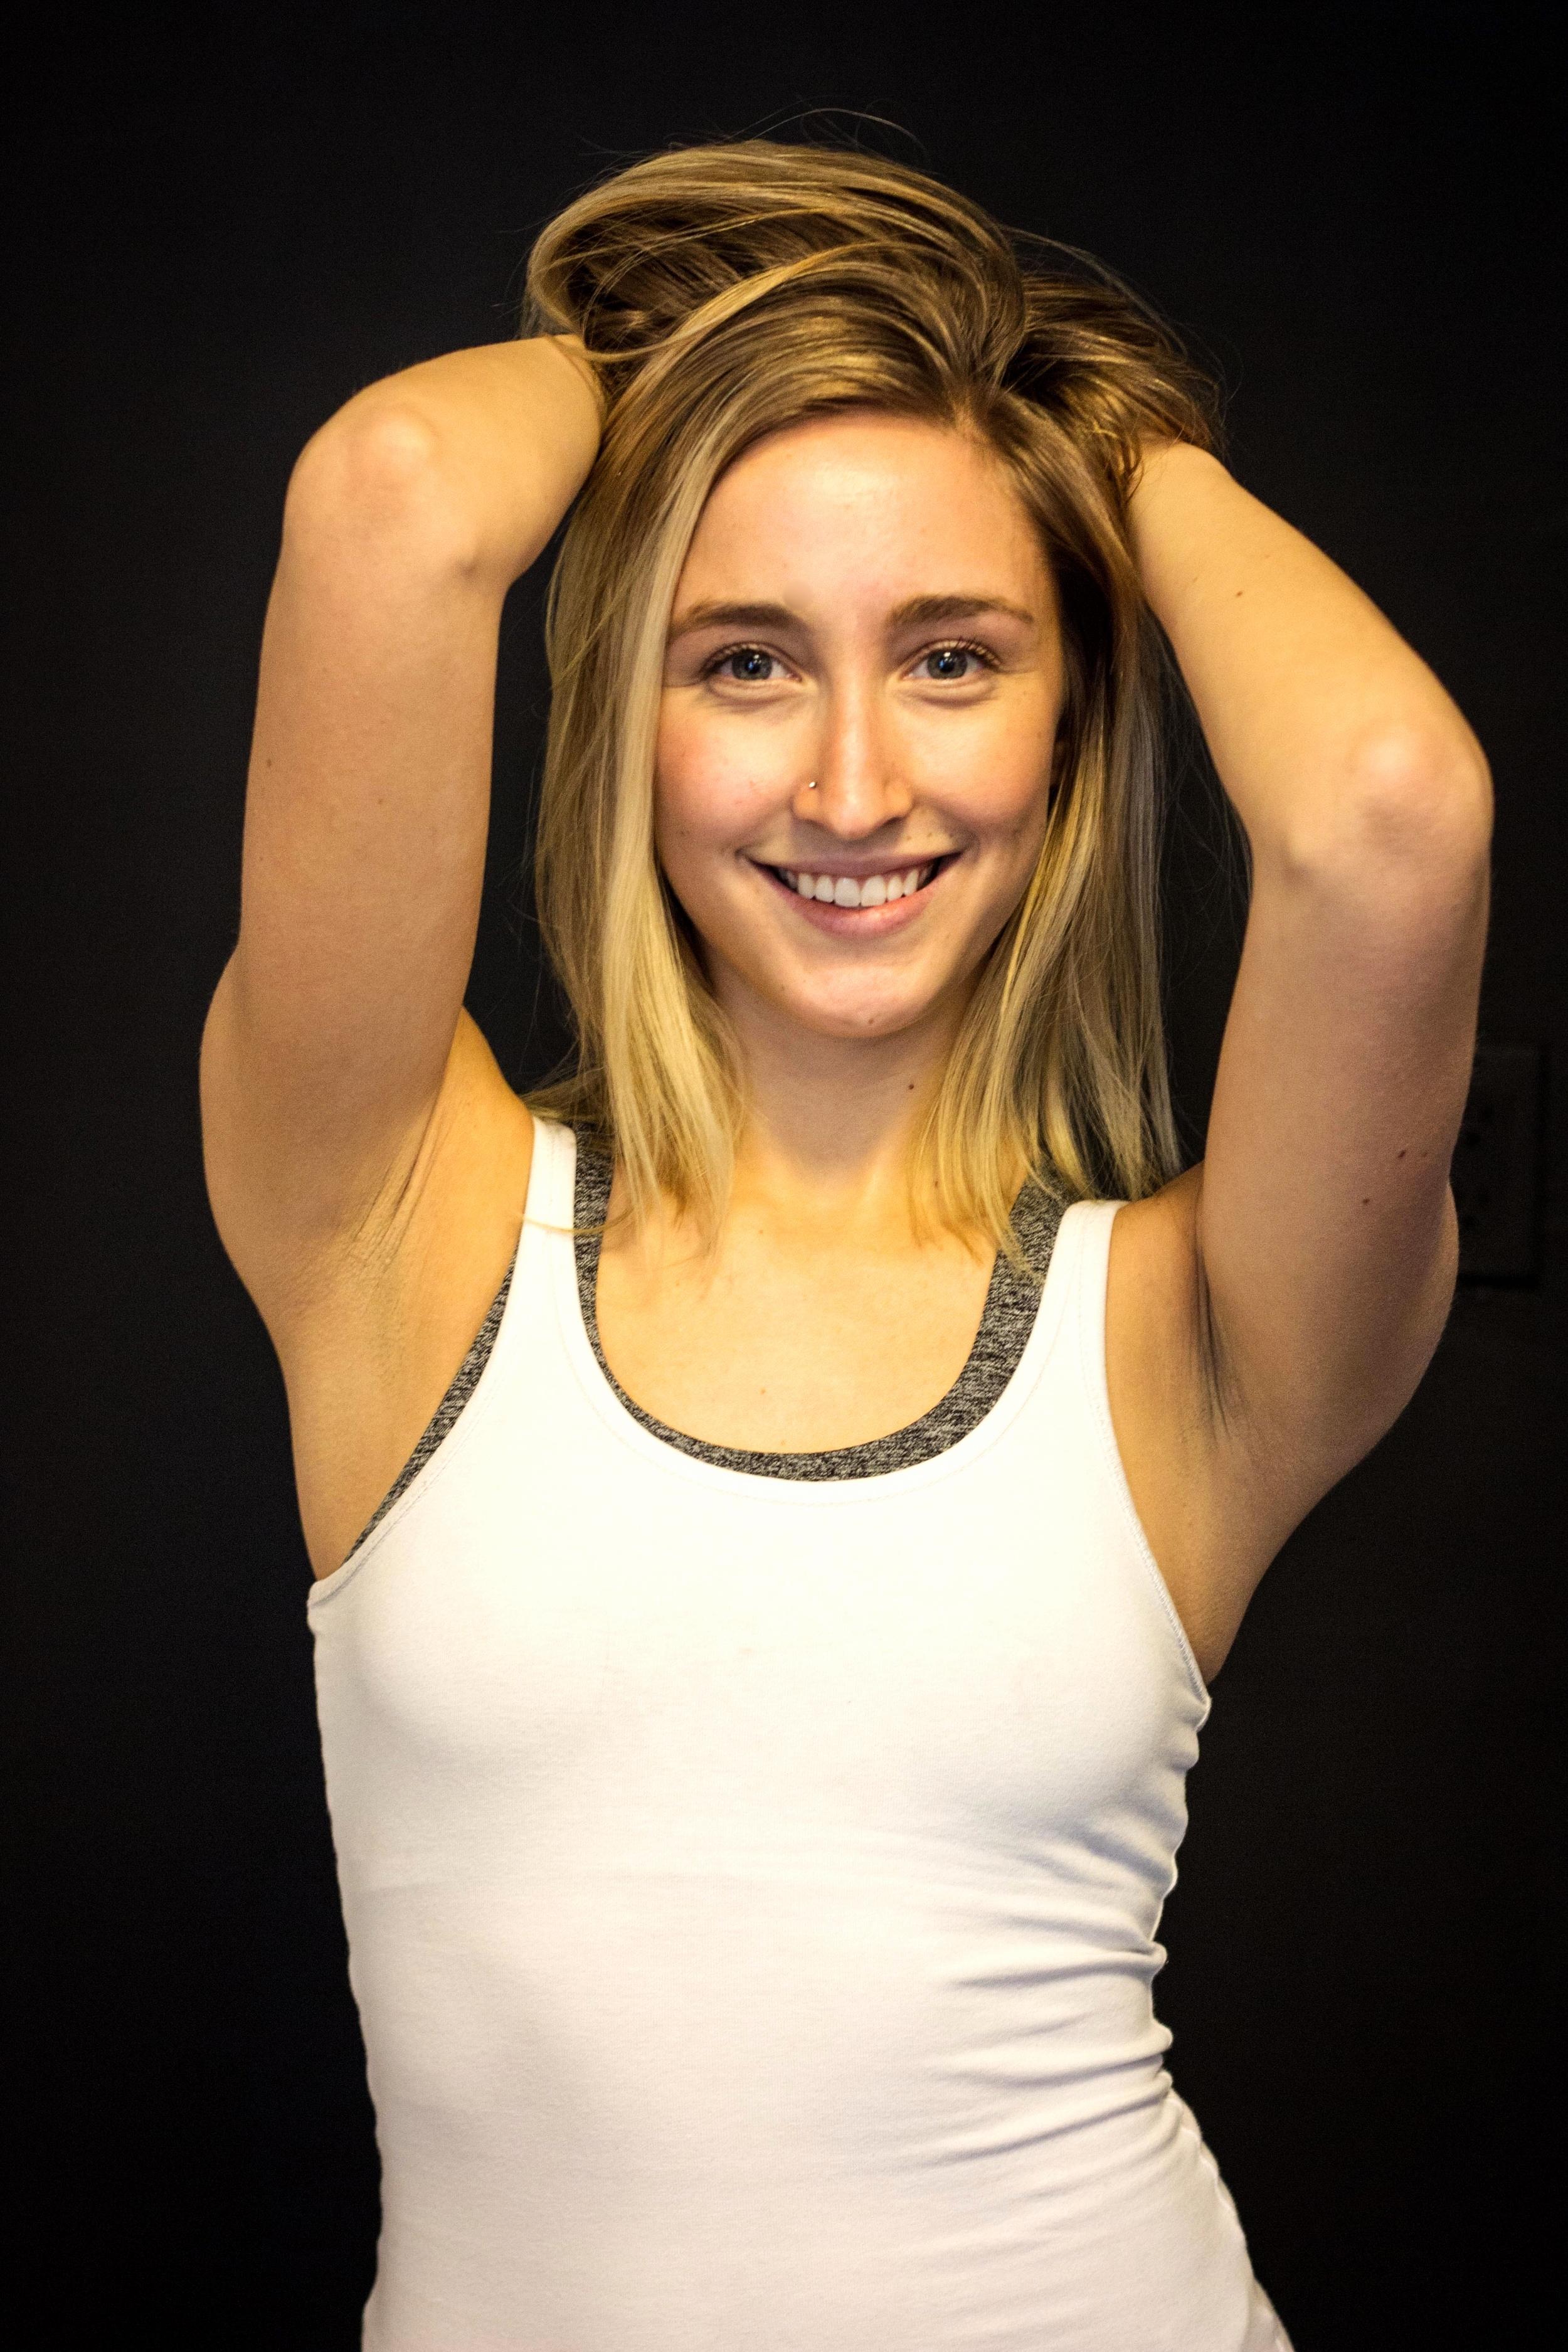 Katy Kauffman, Creative Director & Instructor @ The P.E. Club